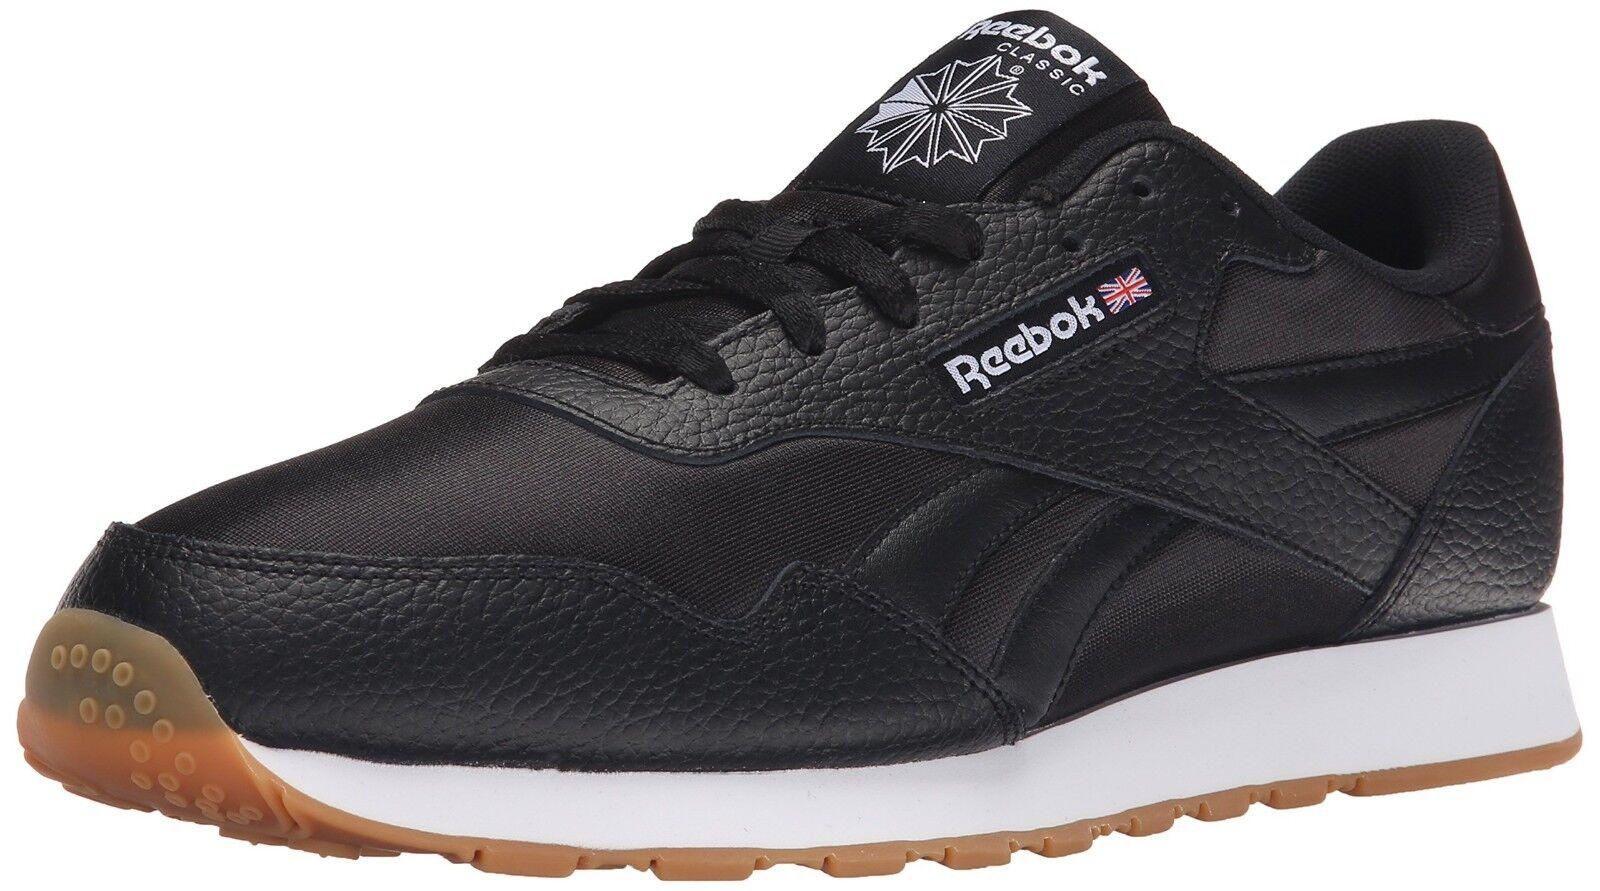 Reebok Royal Nylon Black Gum Leather Men's shoes  New In Box 100% Original